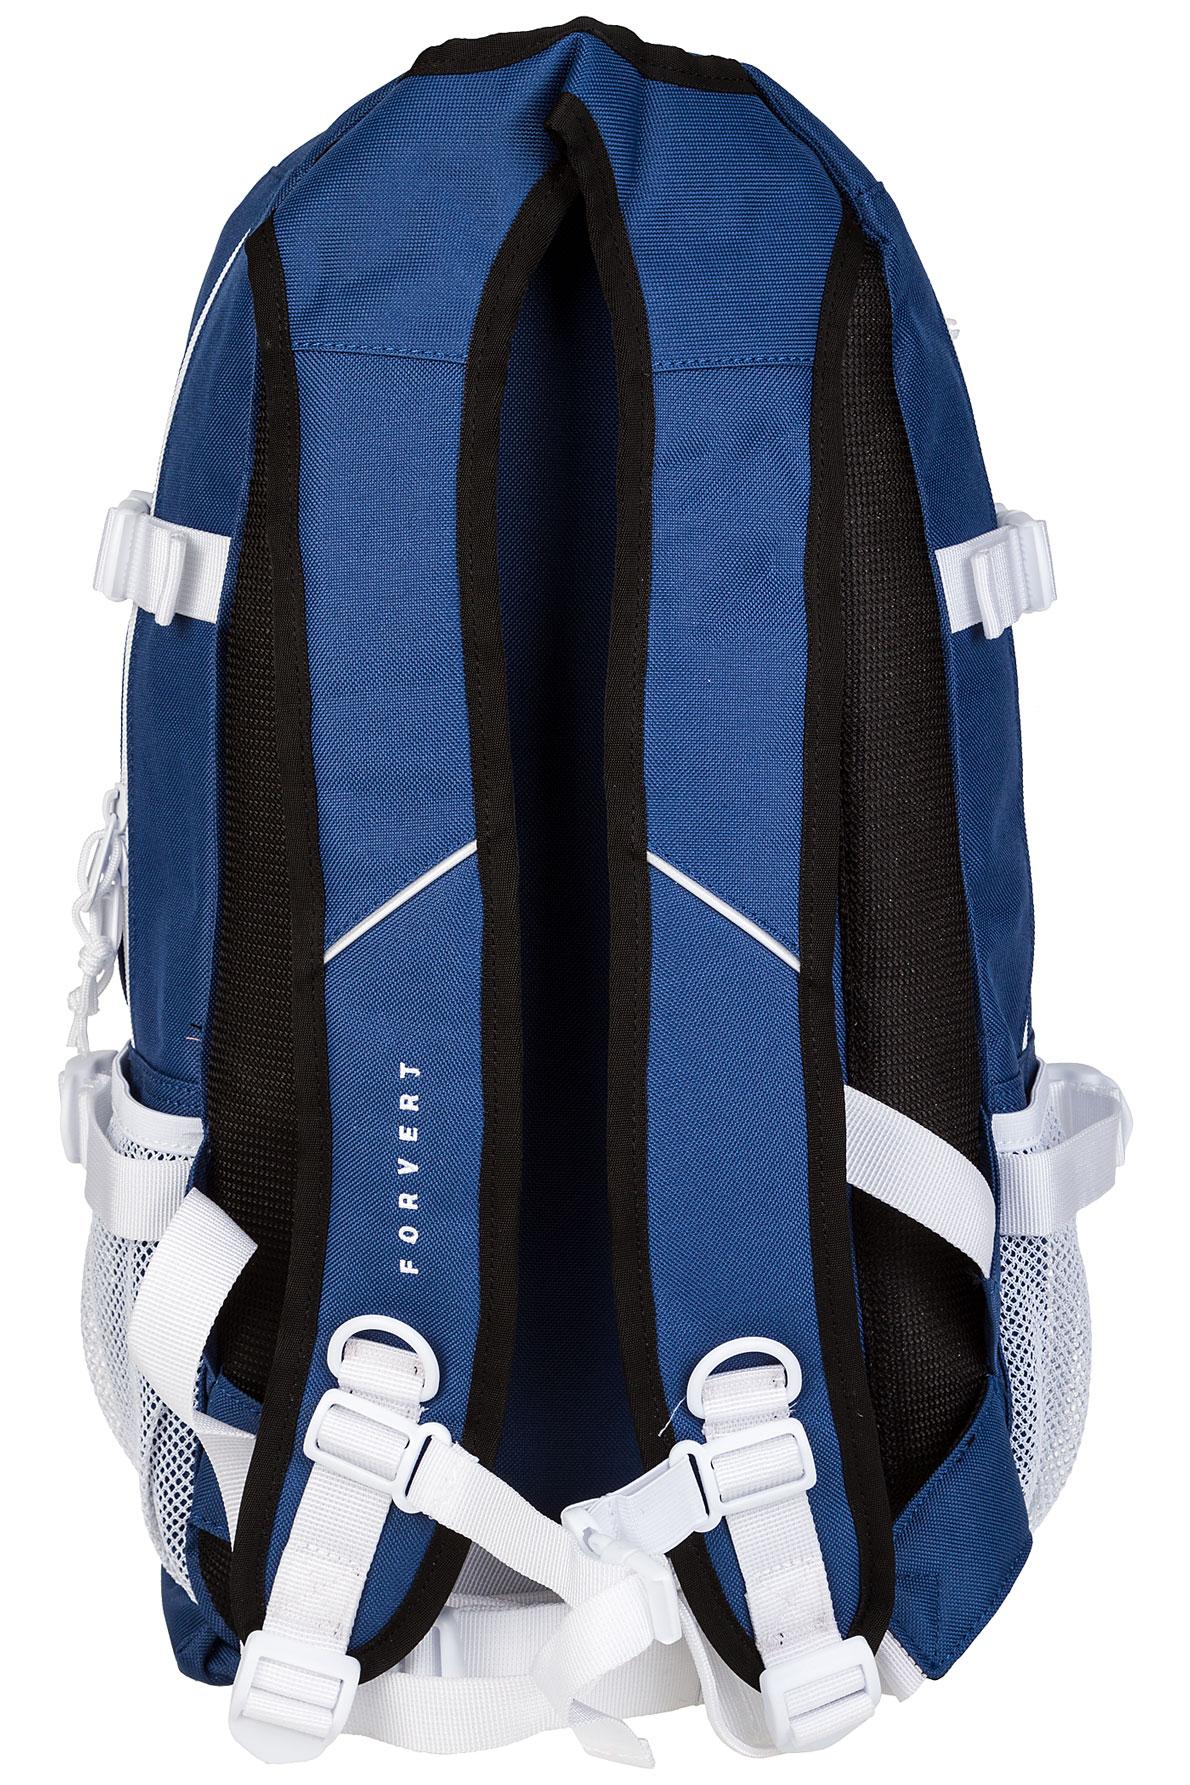 forvert ice louis rucksack 20l blue kaufen bei skatedeluxe. Black Bedroom Furniture Sets. Home Design Ideas